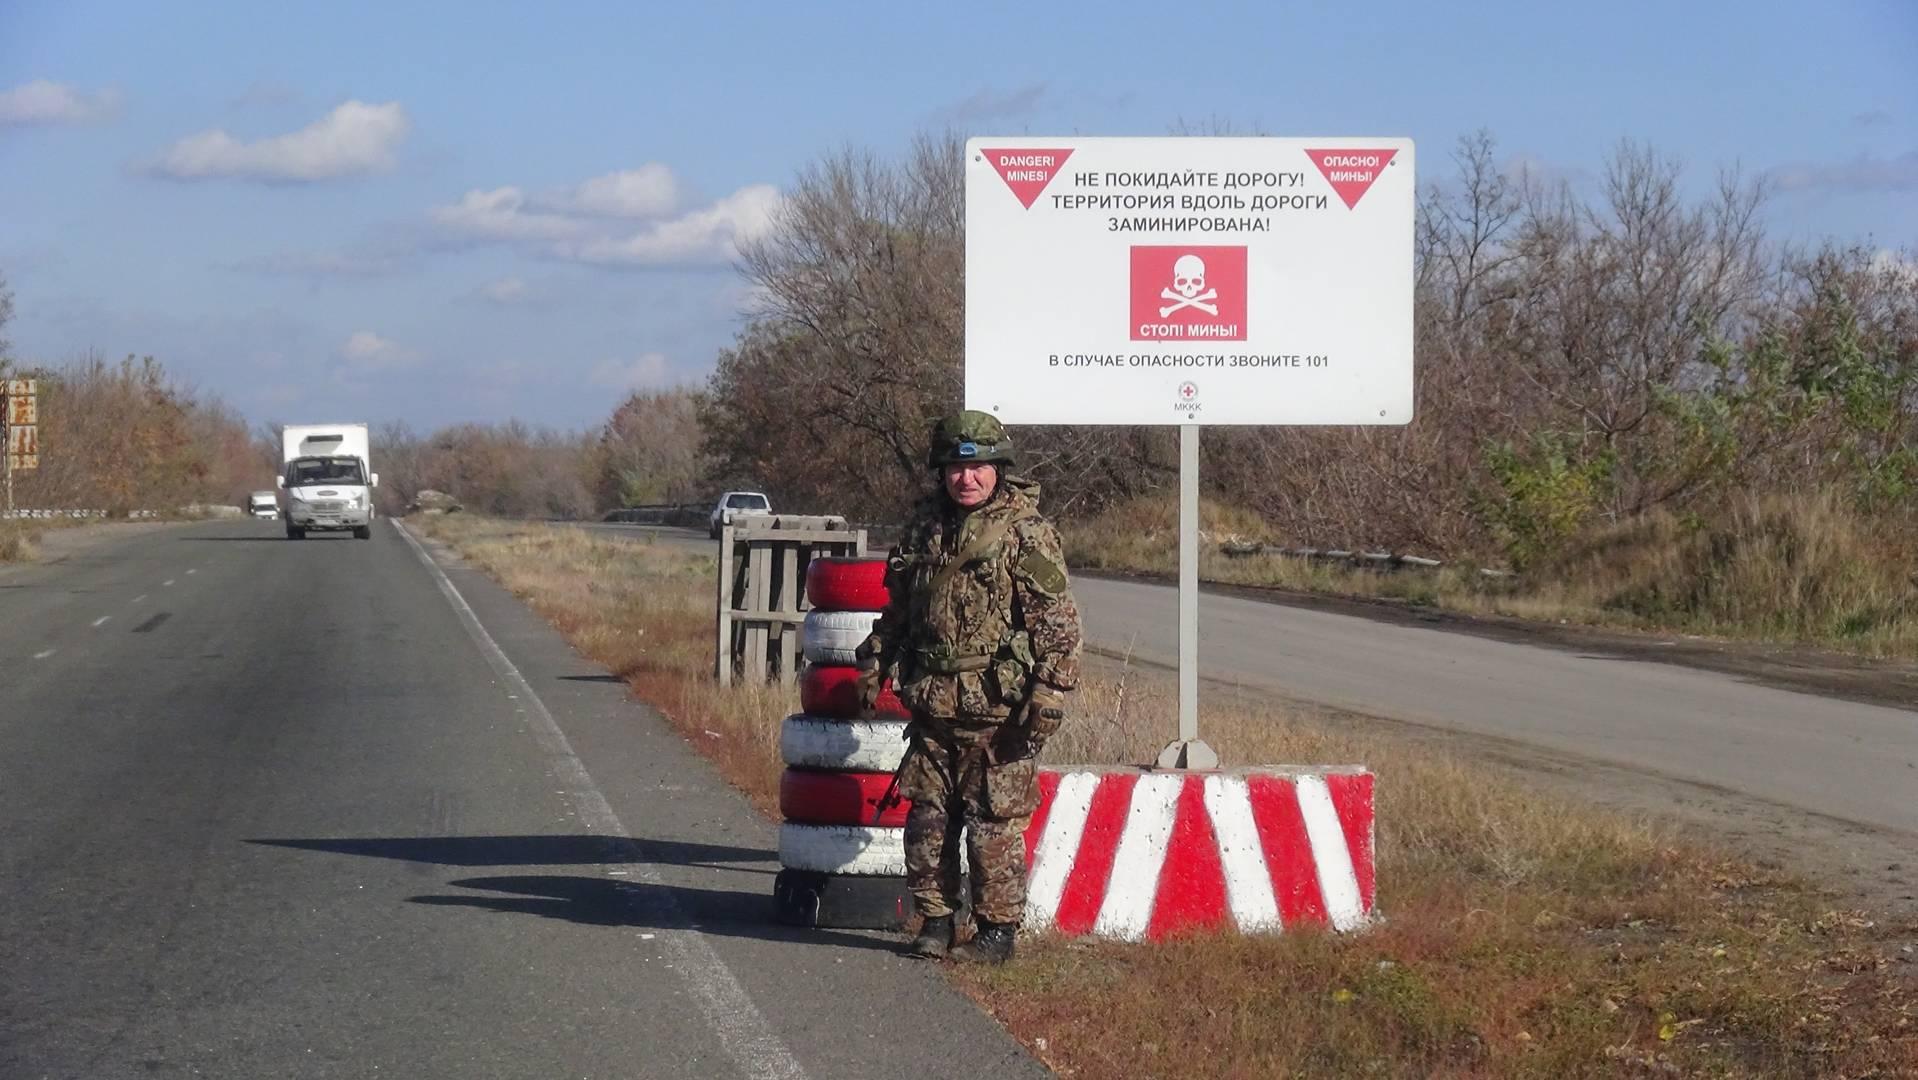 ДНР. «Территория вдоль дороги заминирована!». Октябрь 2018